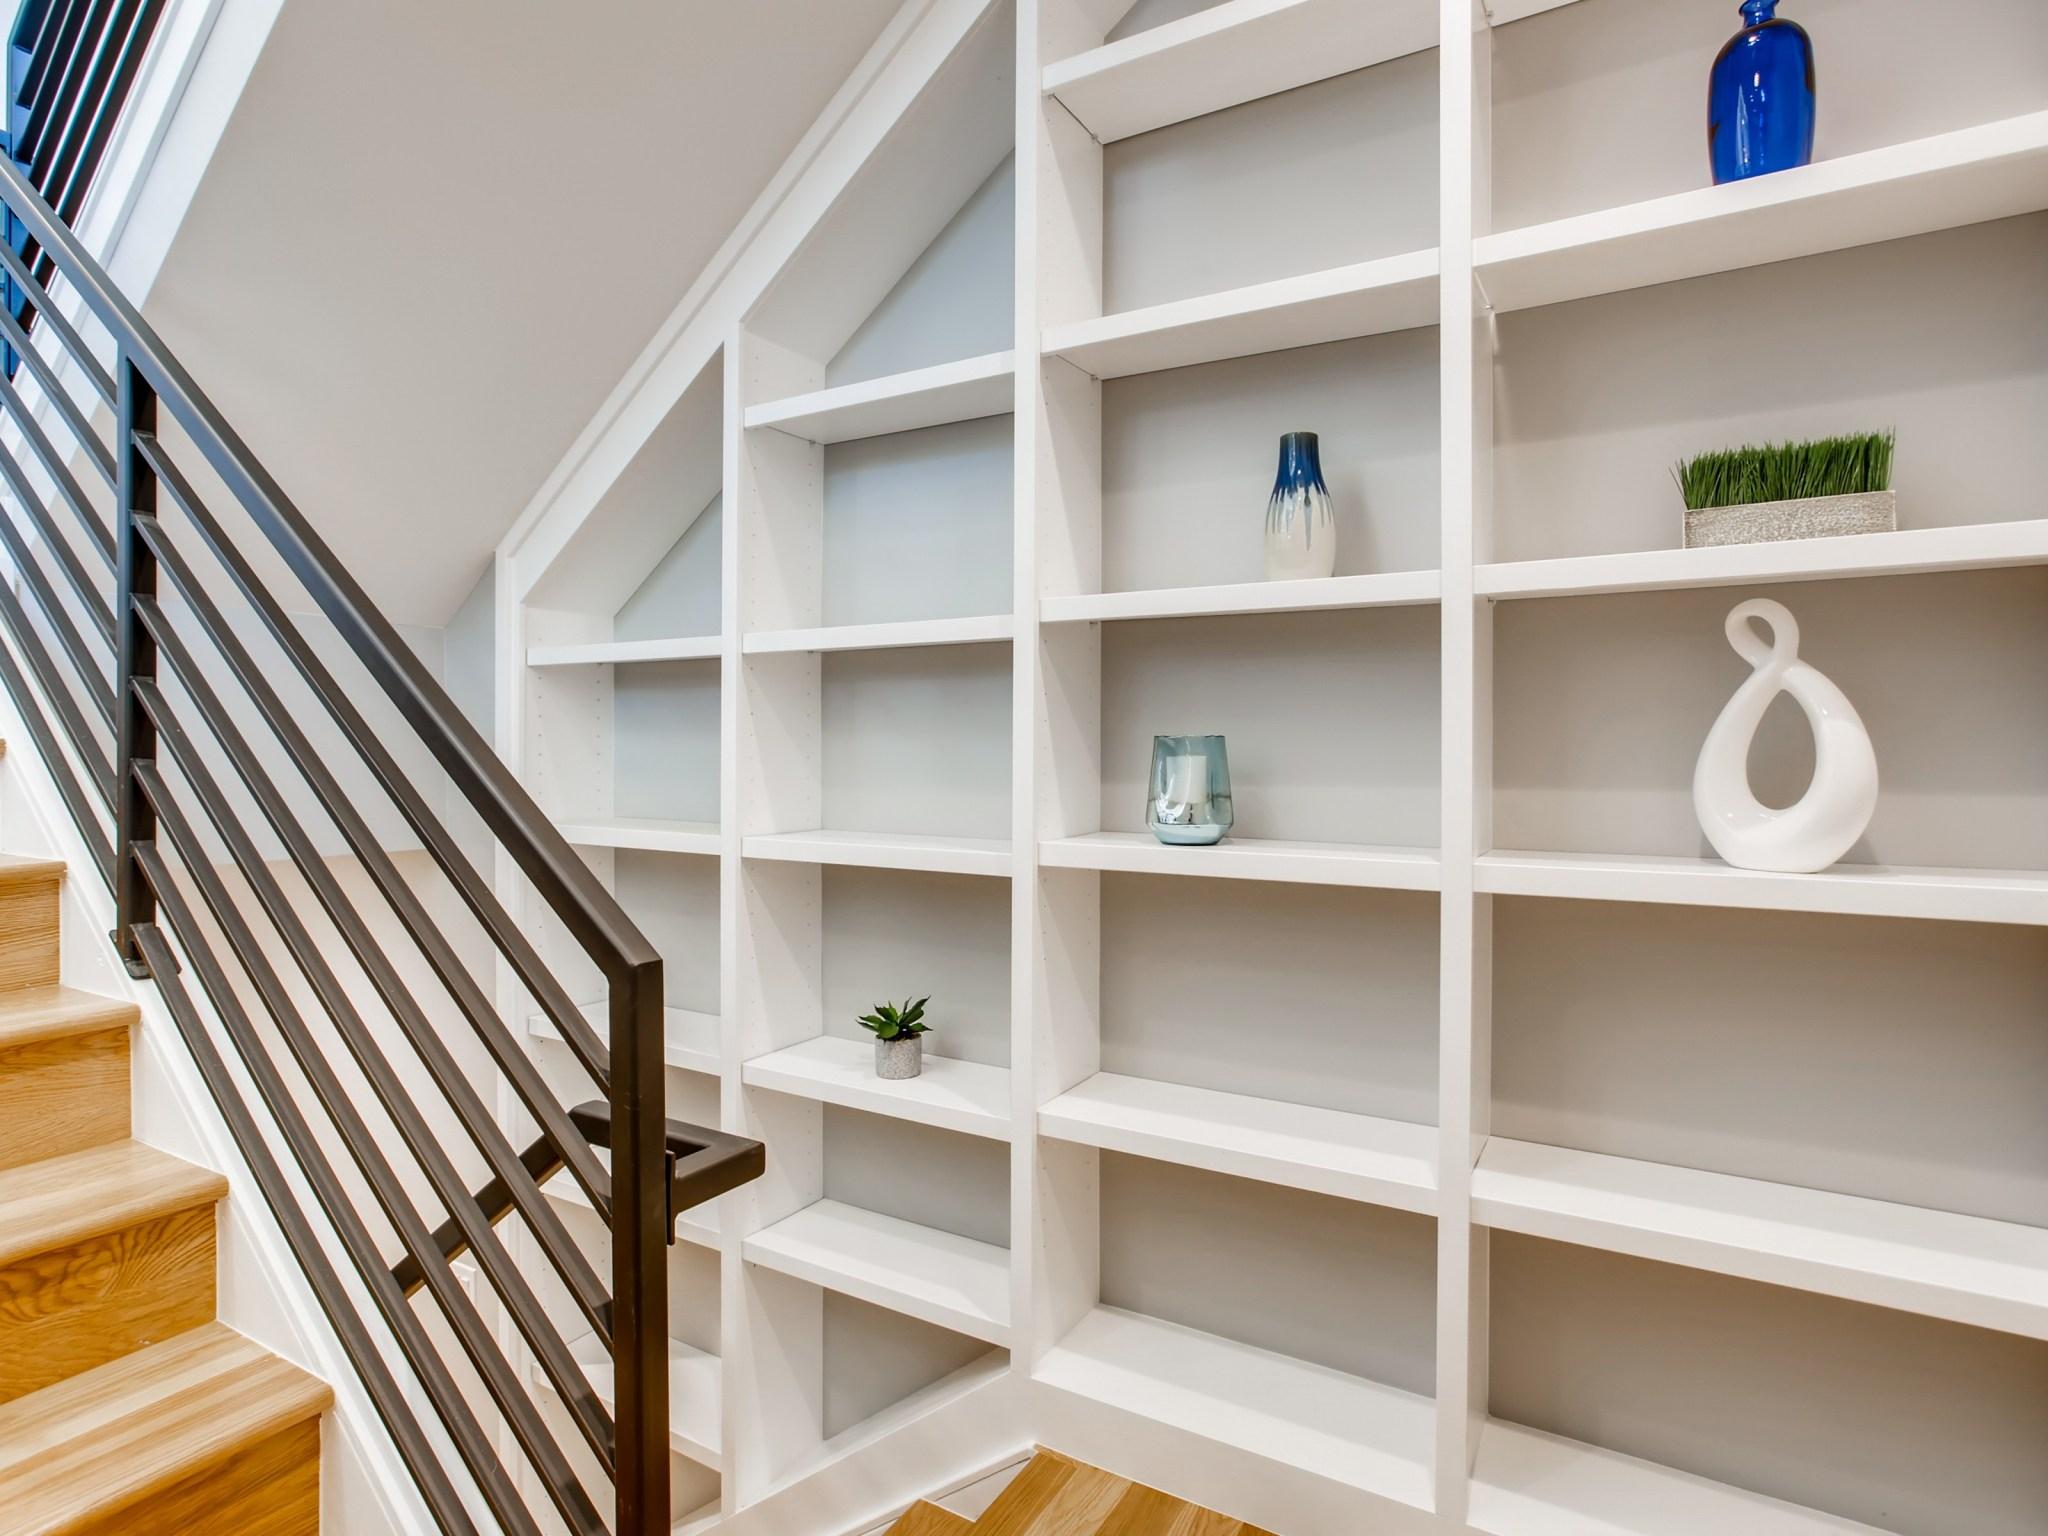 Built-in bookshelves in stairs.